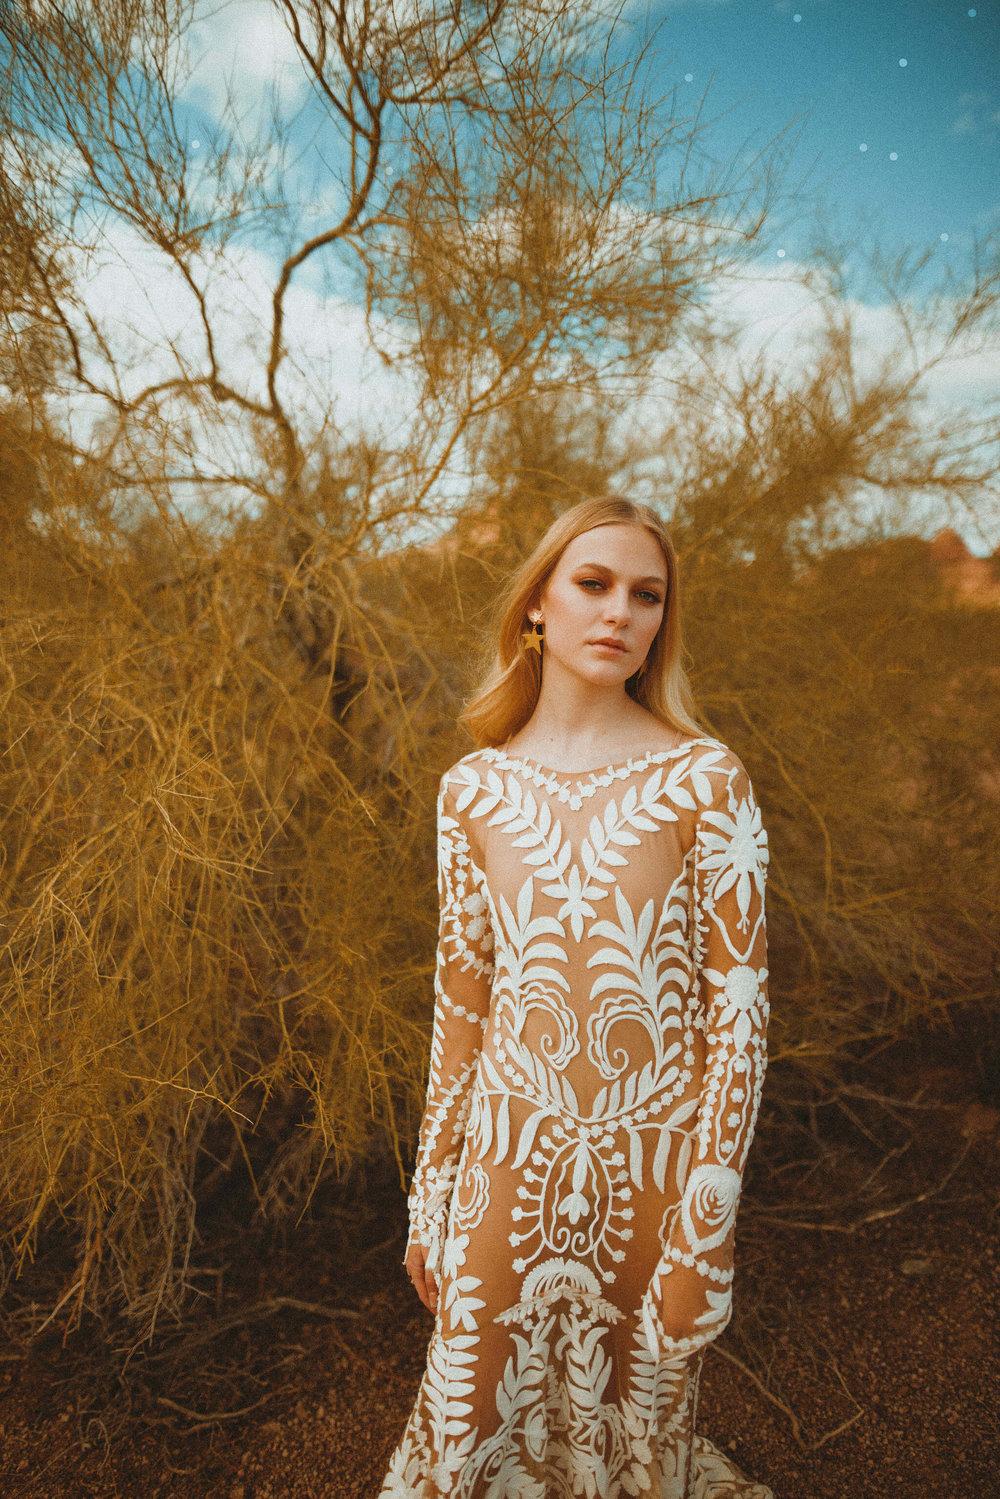 Allison-Markova-photography-squaremuse4.jpg